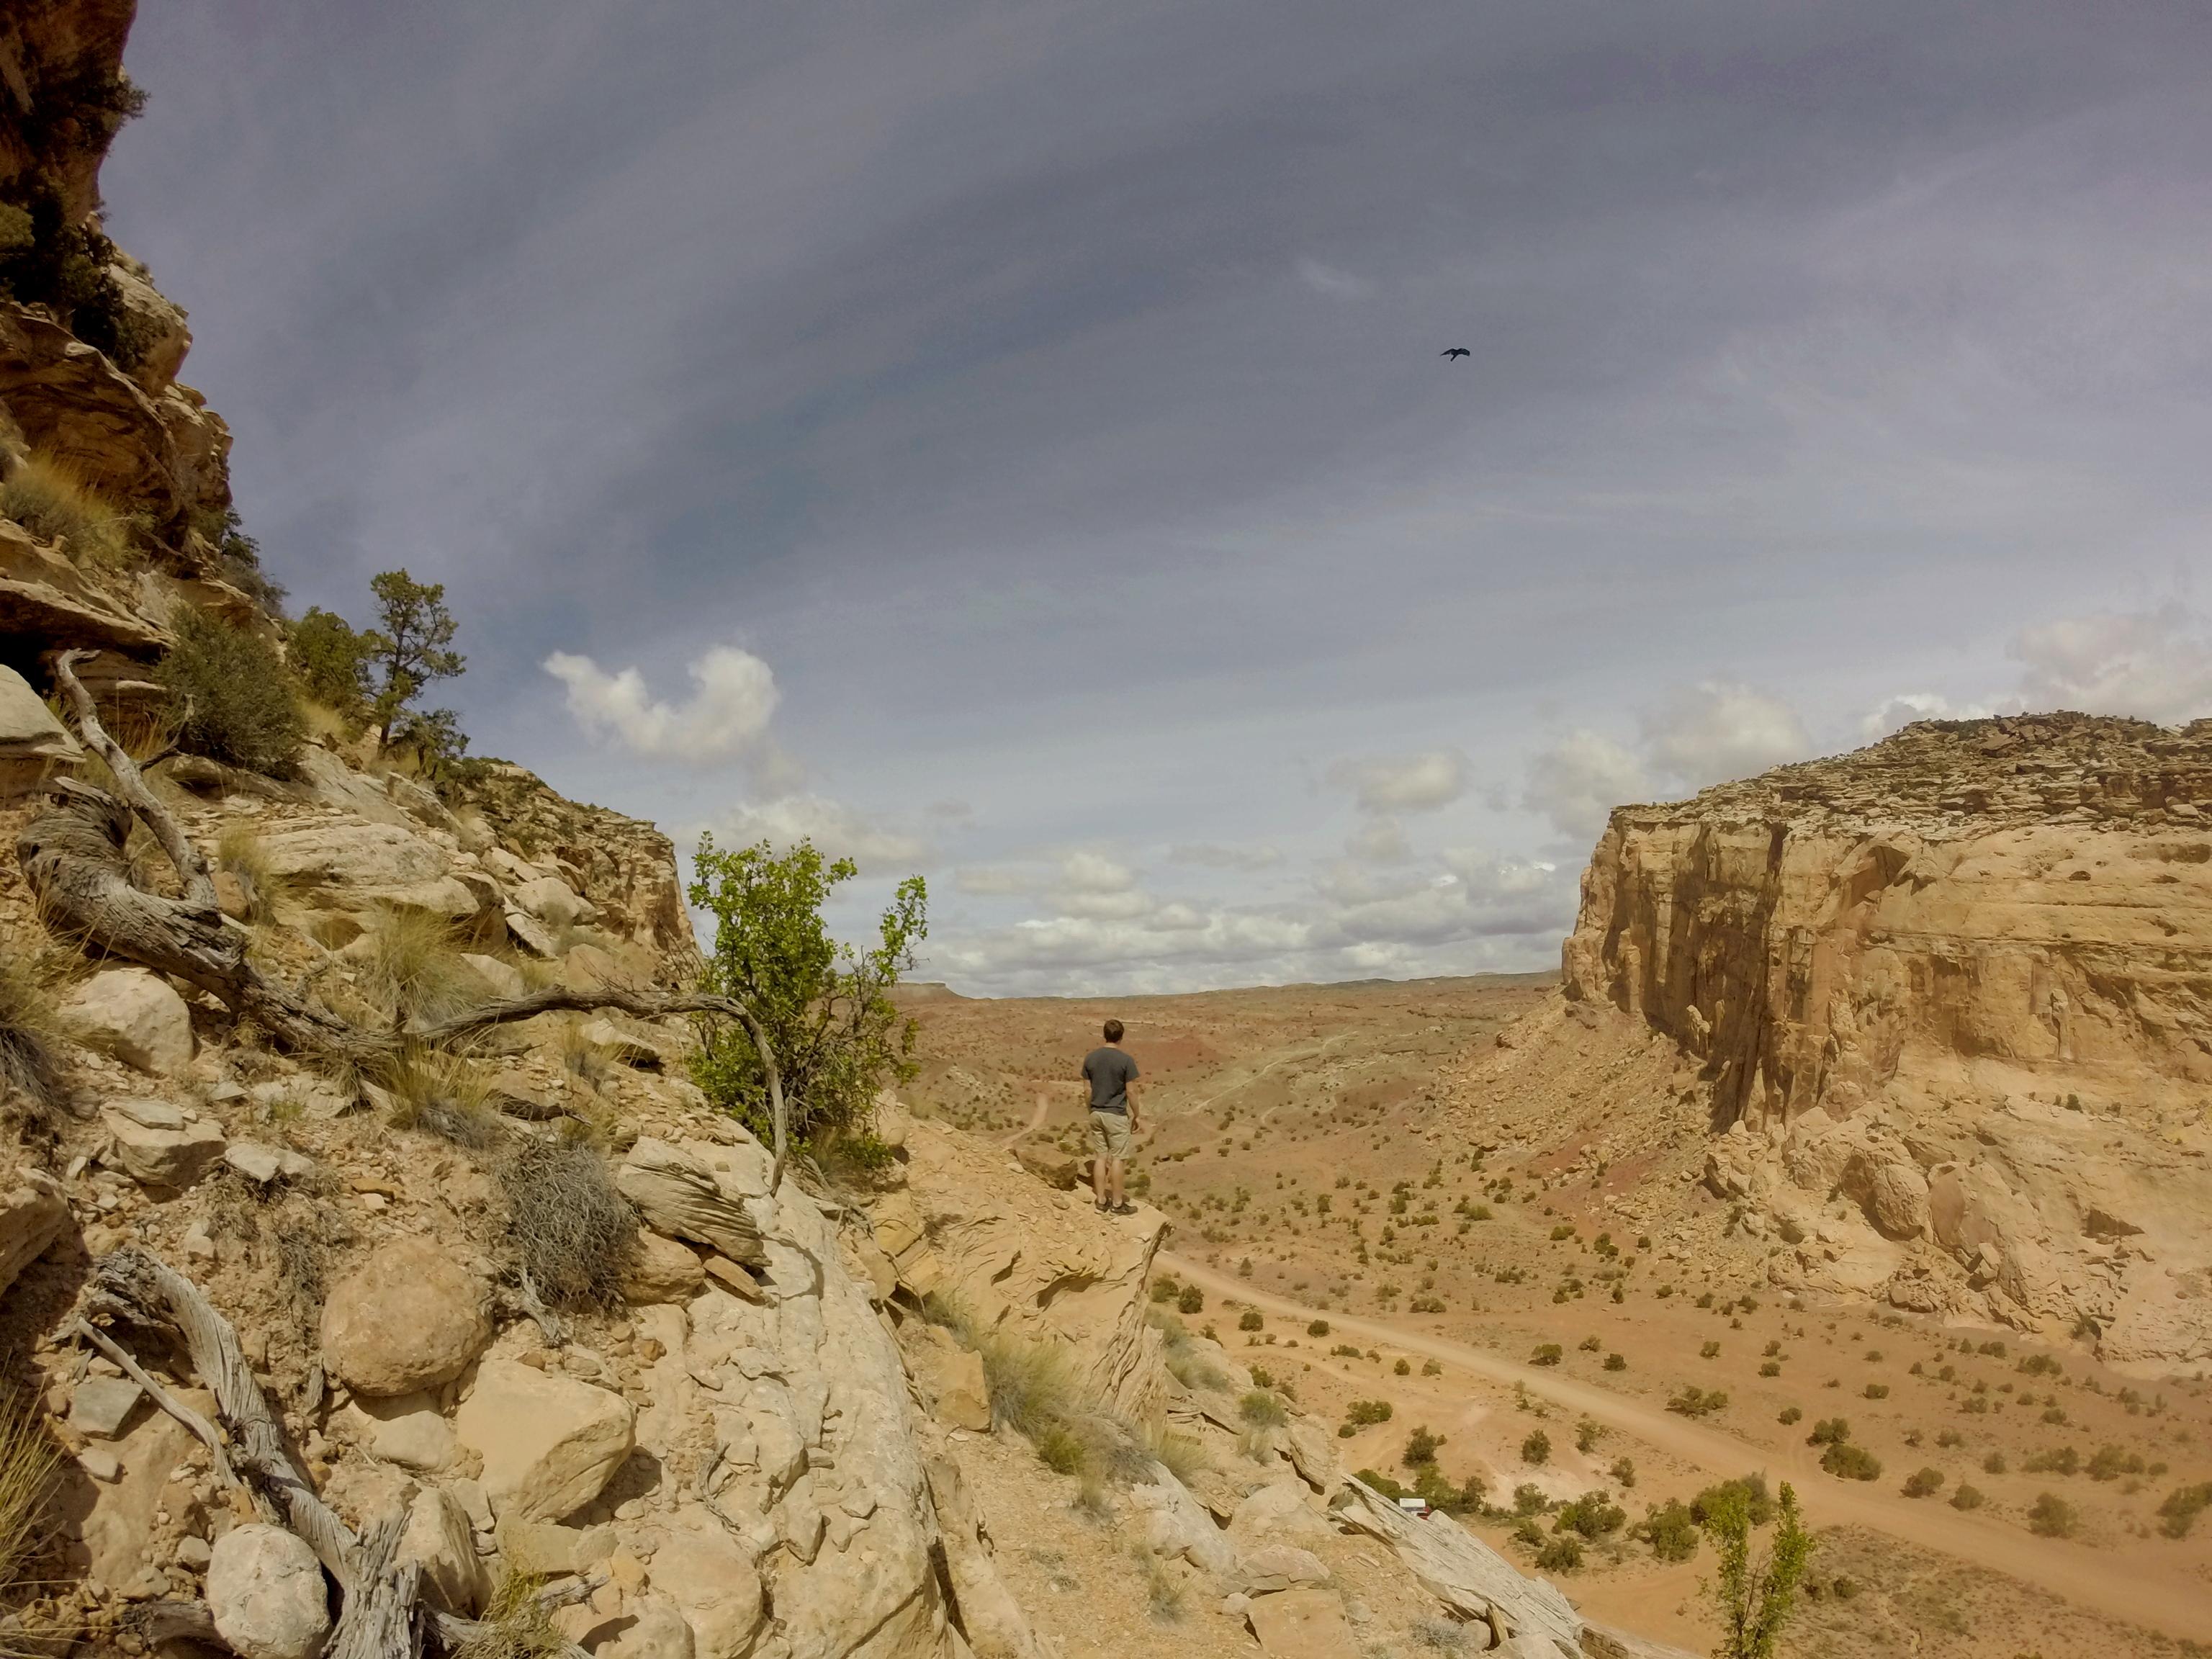 Overlook of BLM land near Goblin Valley